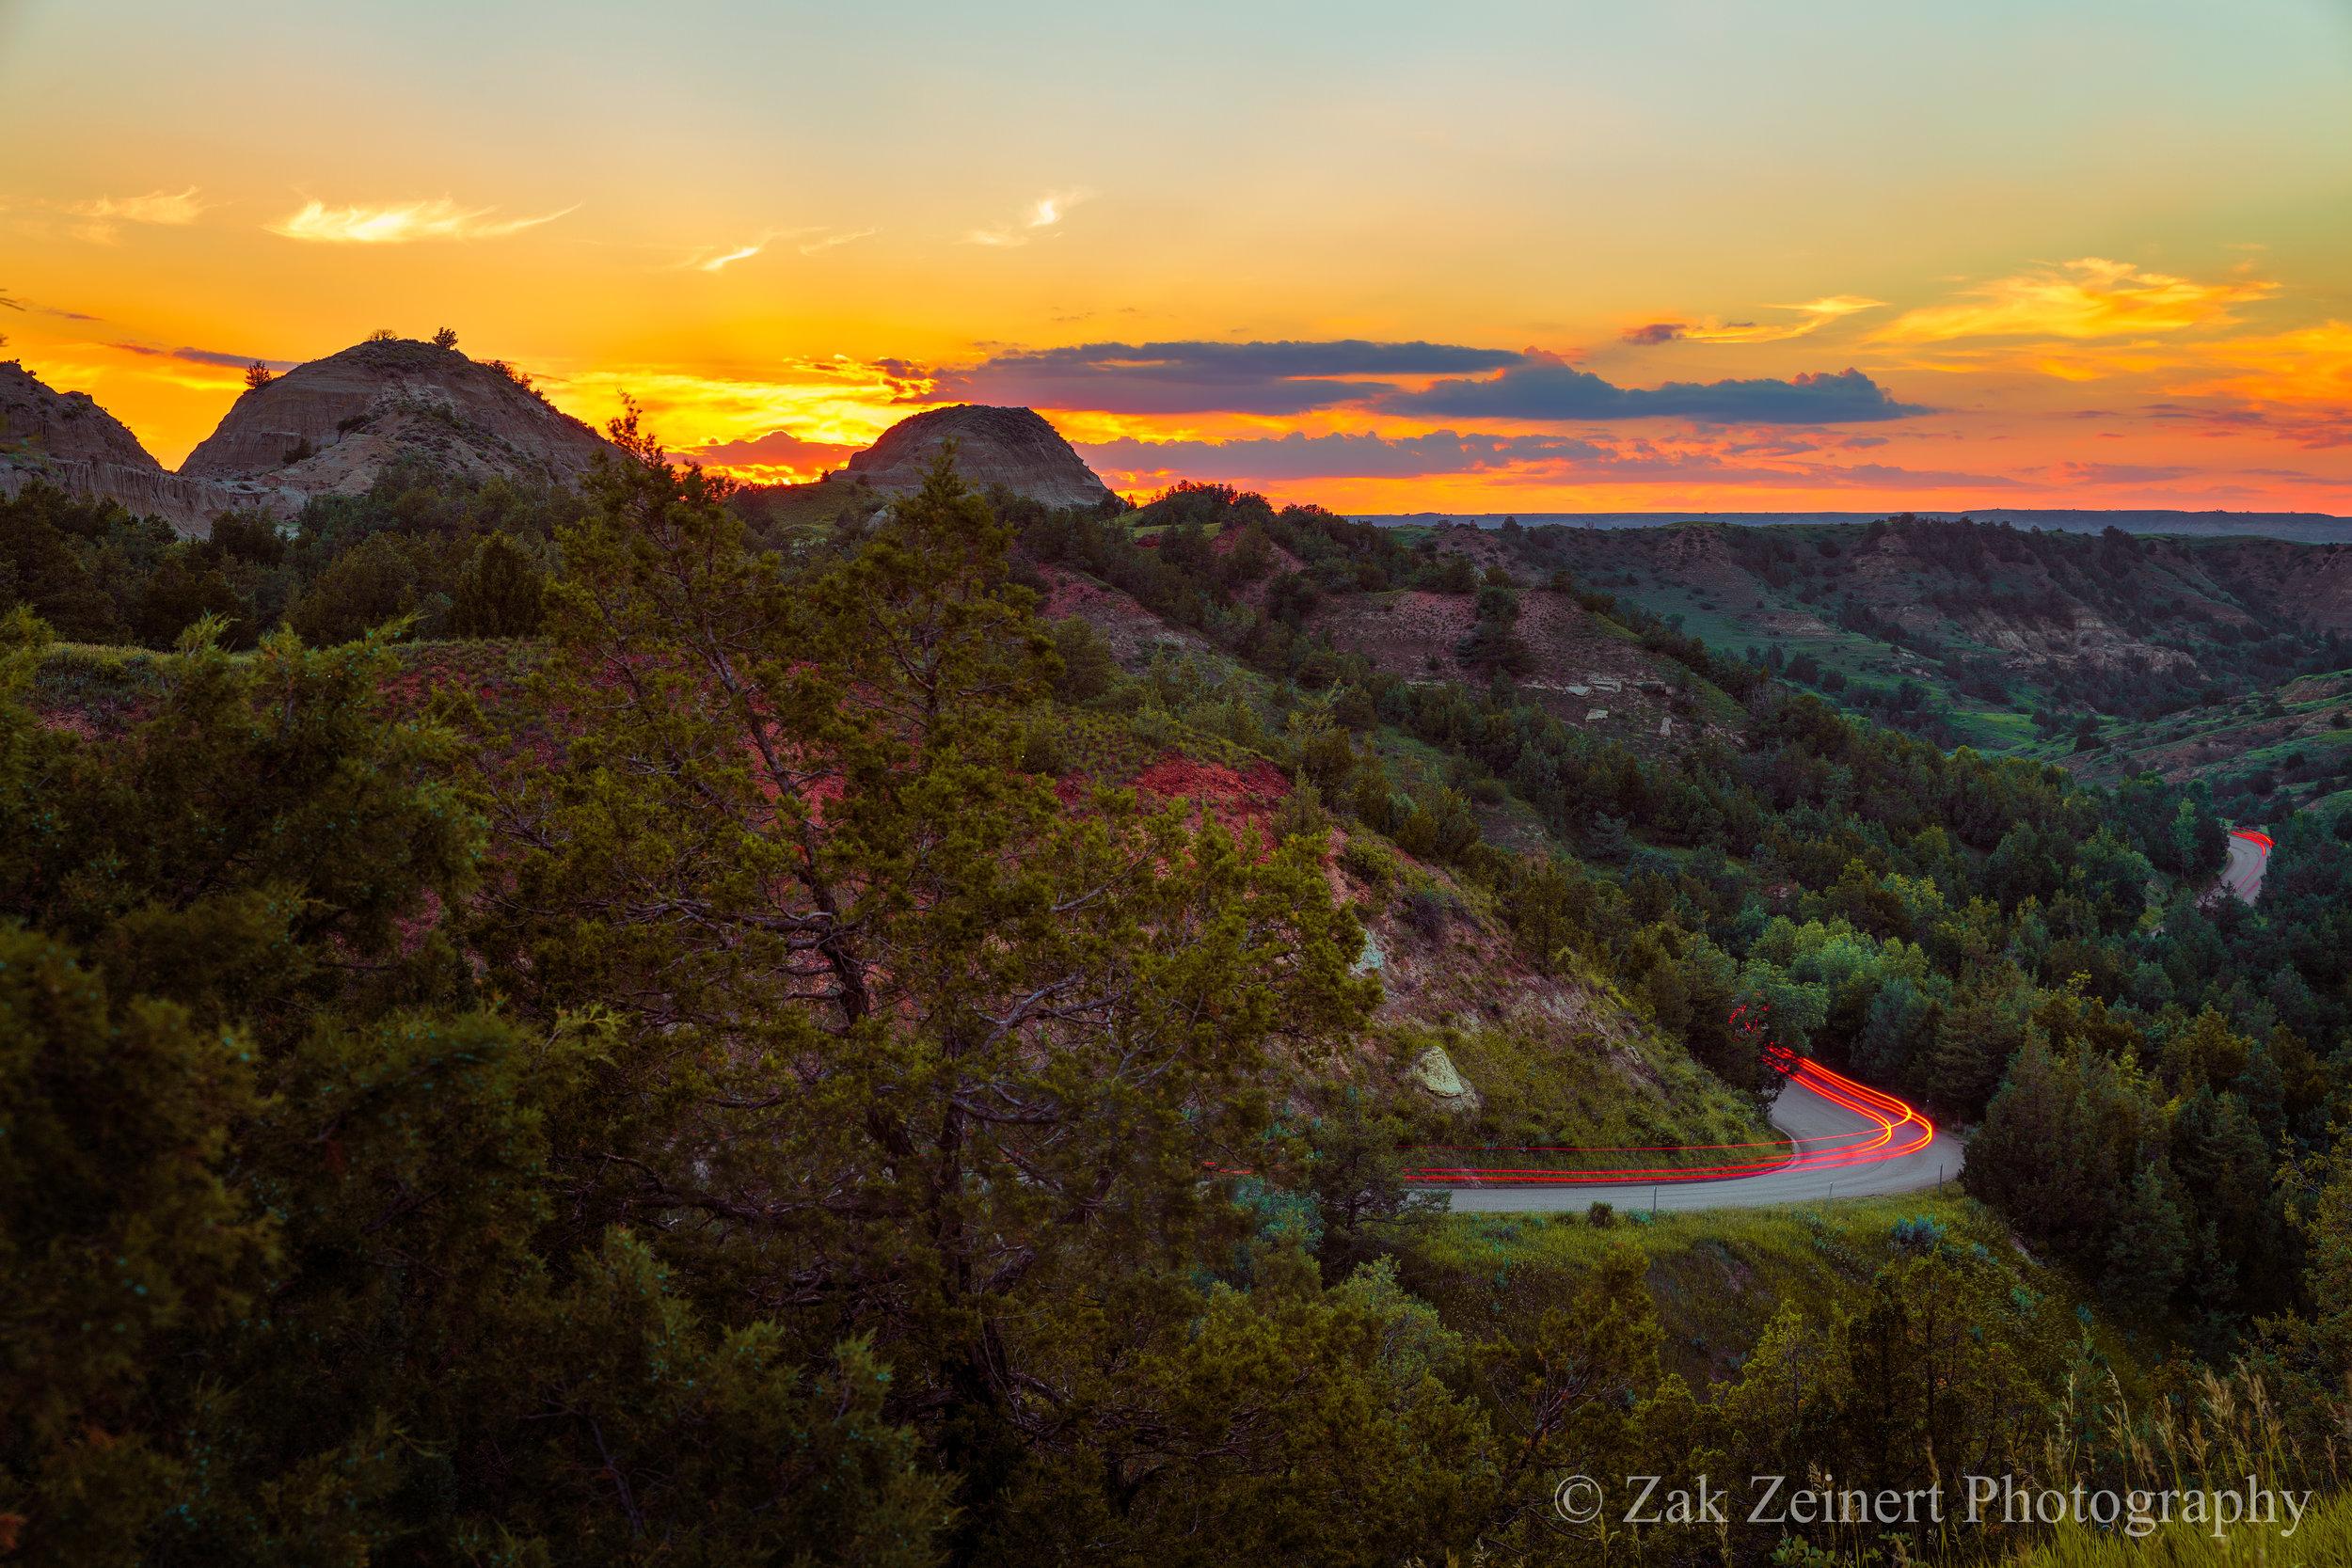 The sun sets behind Scoria Point overlook on the 36-mile park loop